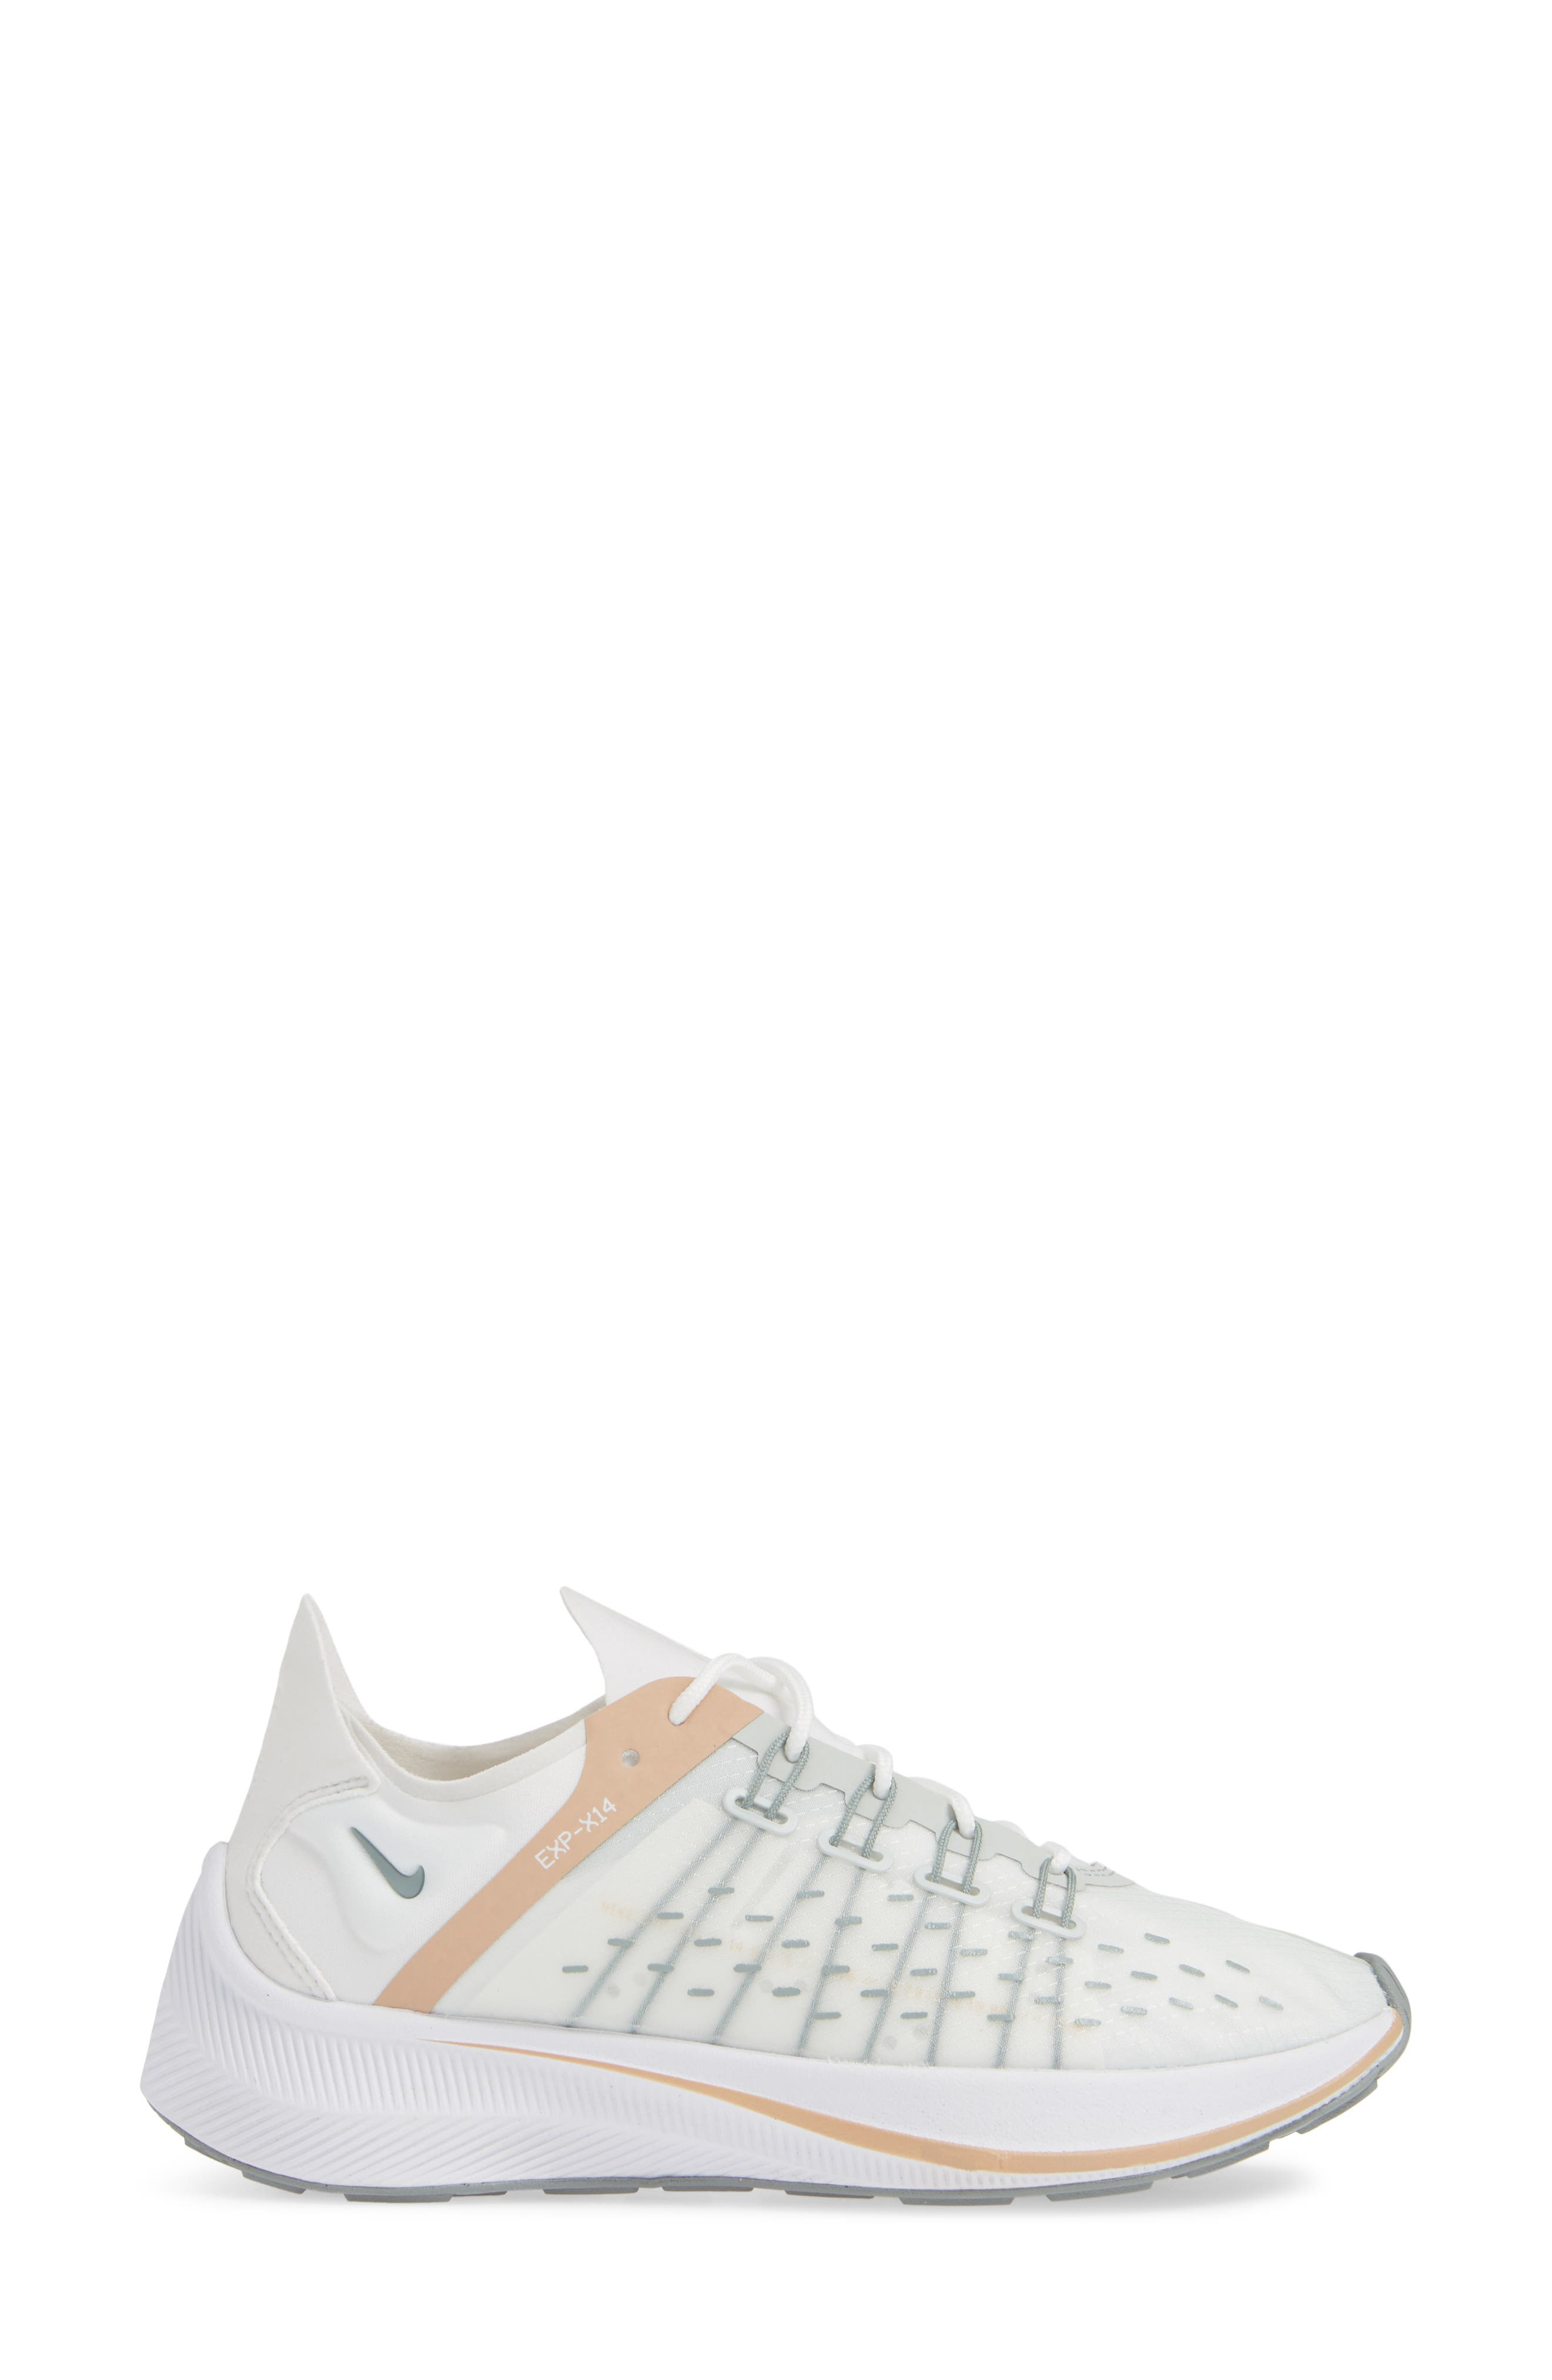 EXP-X14 Sneaker,                             Alternate thumbnail 3, color,                             SUMMIT WHITE/ LIGHT SILVER